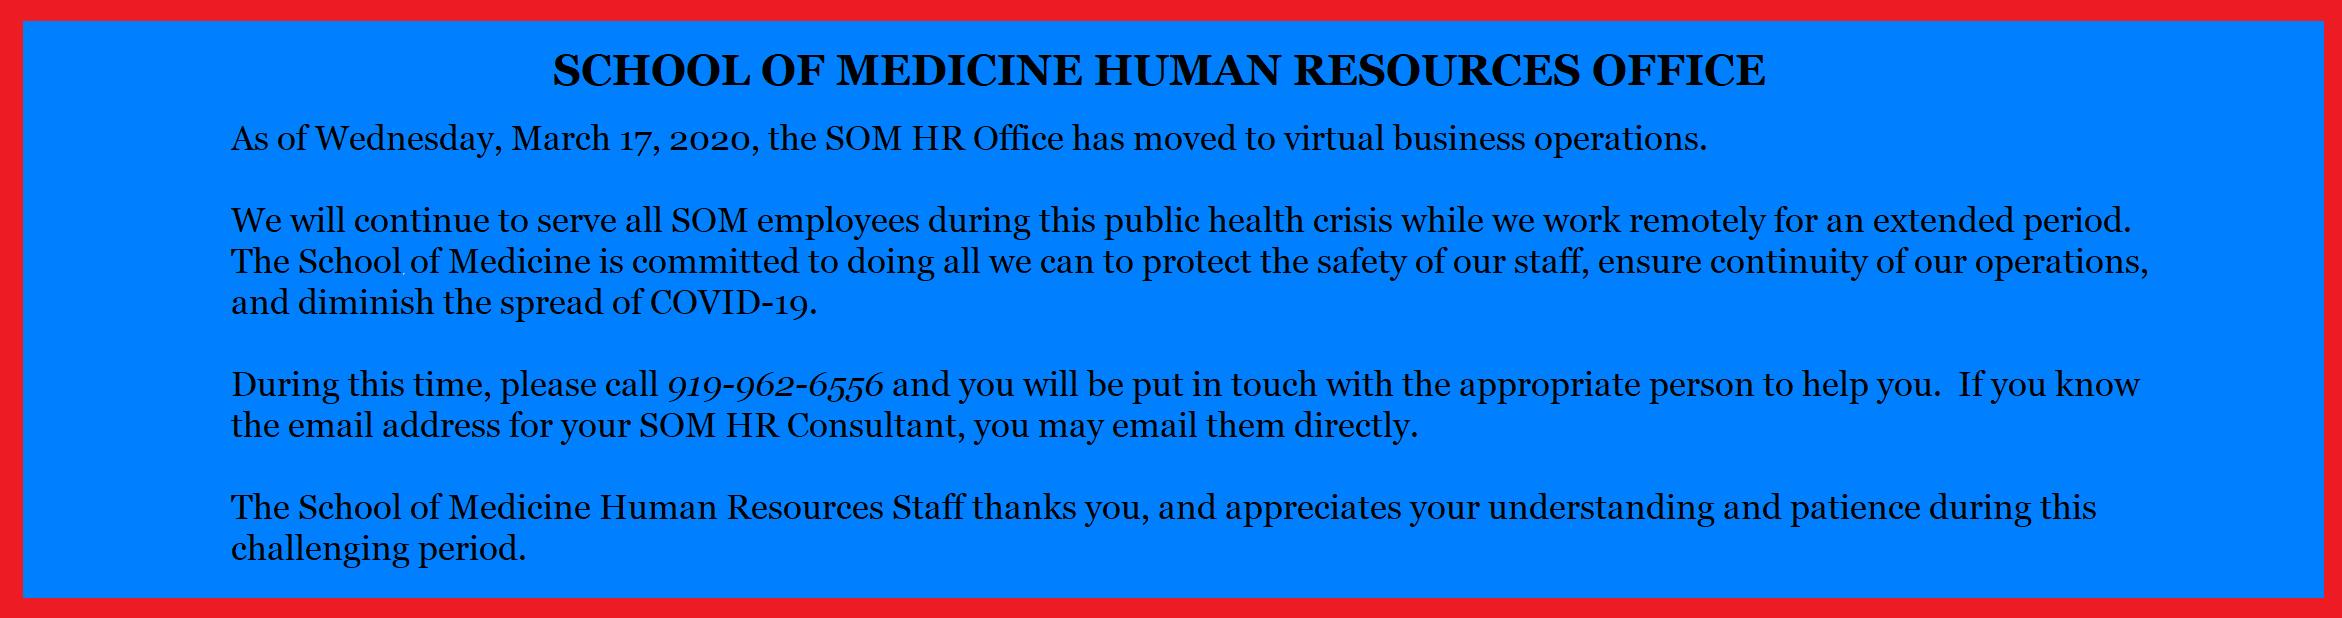 Remote Work Announce